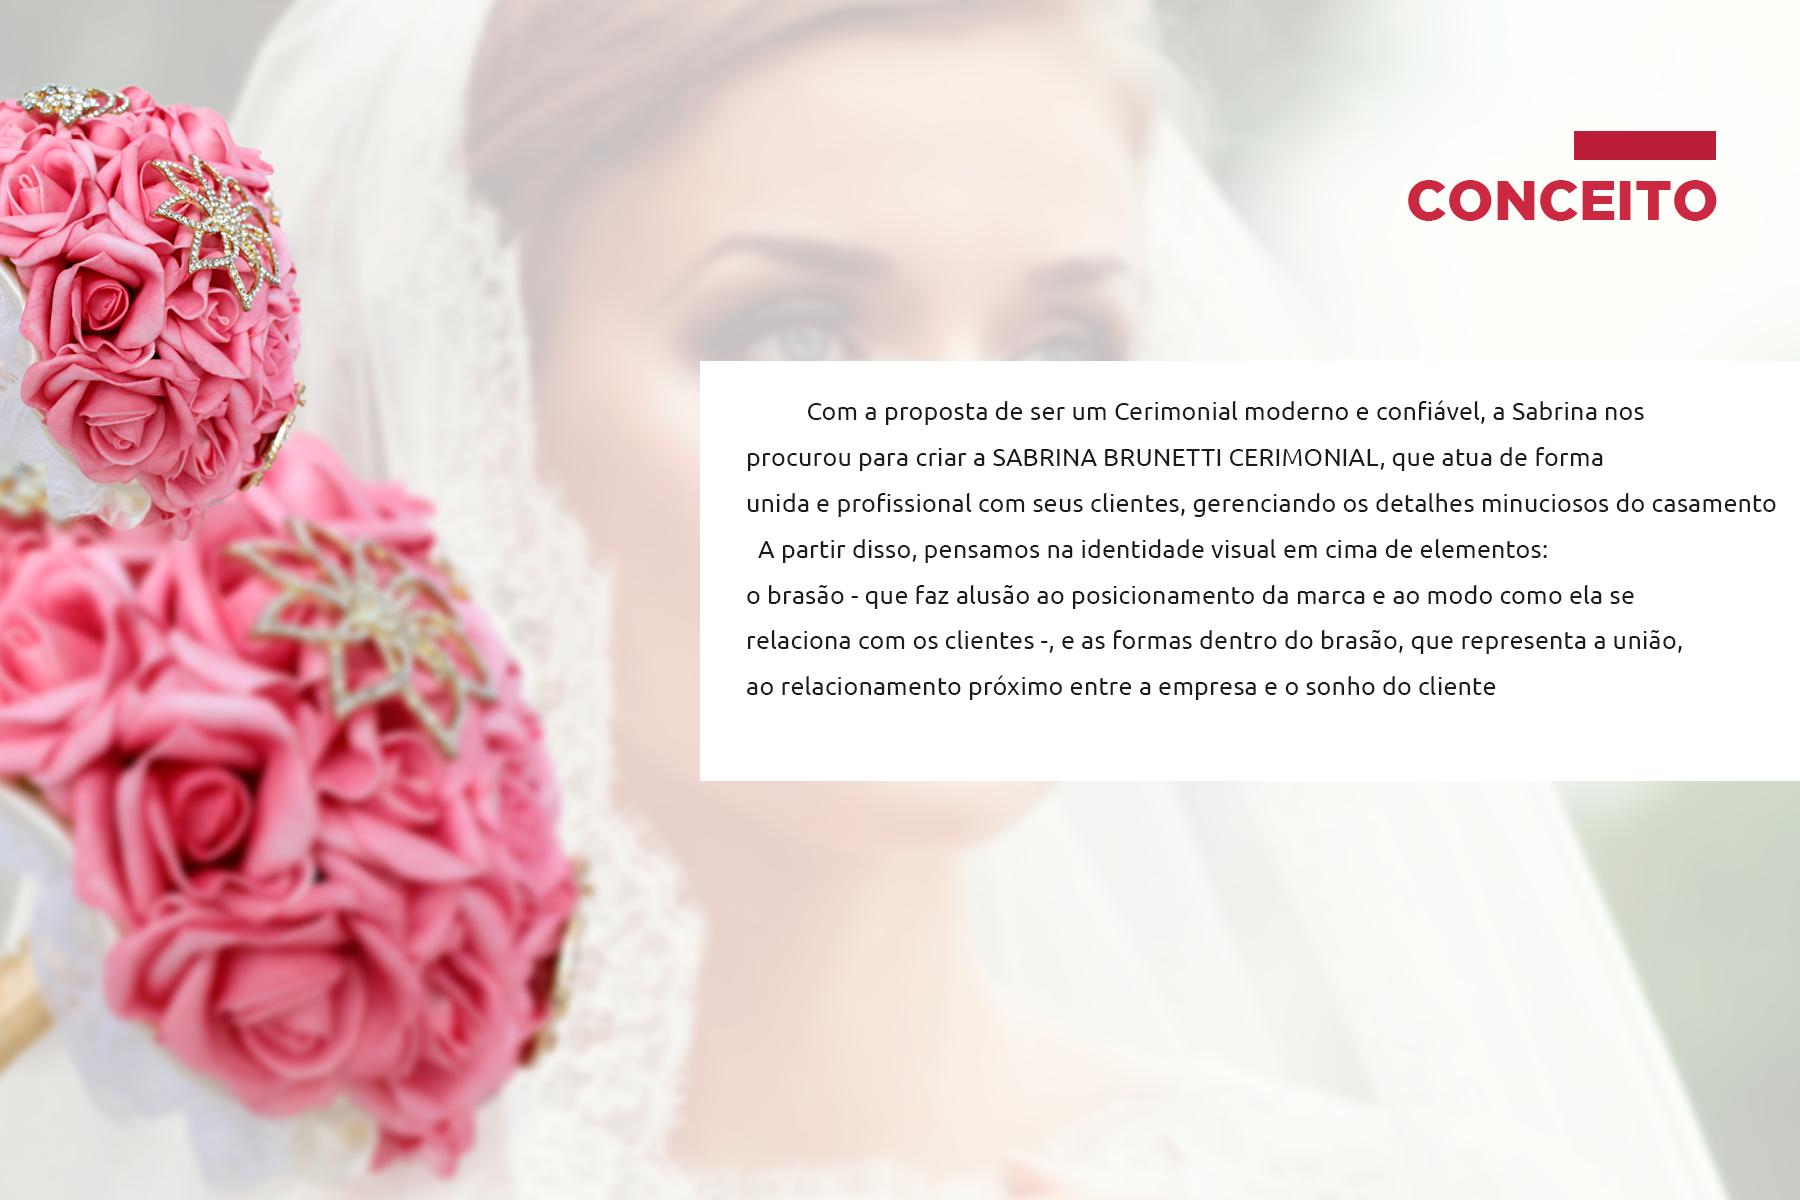 460ce431199469.5645493a7e954 - Sabrina Brunetti